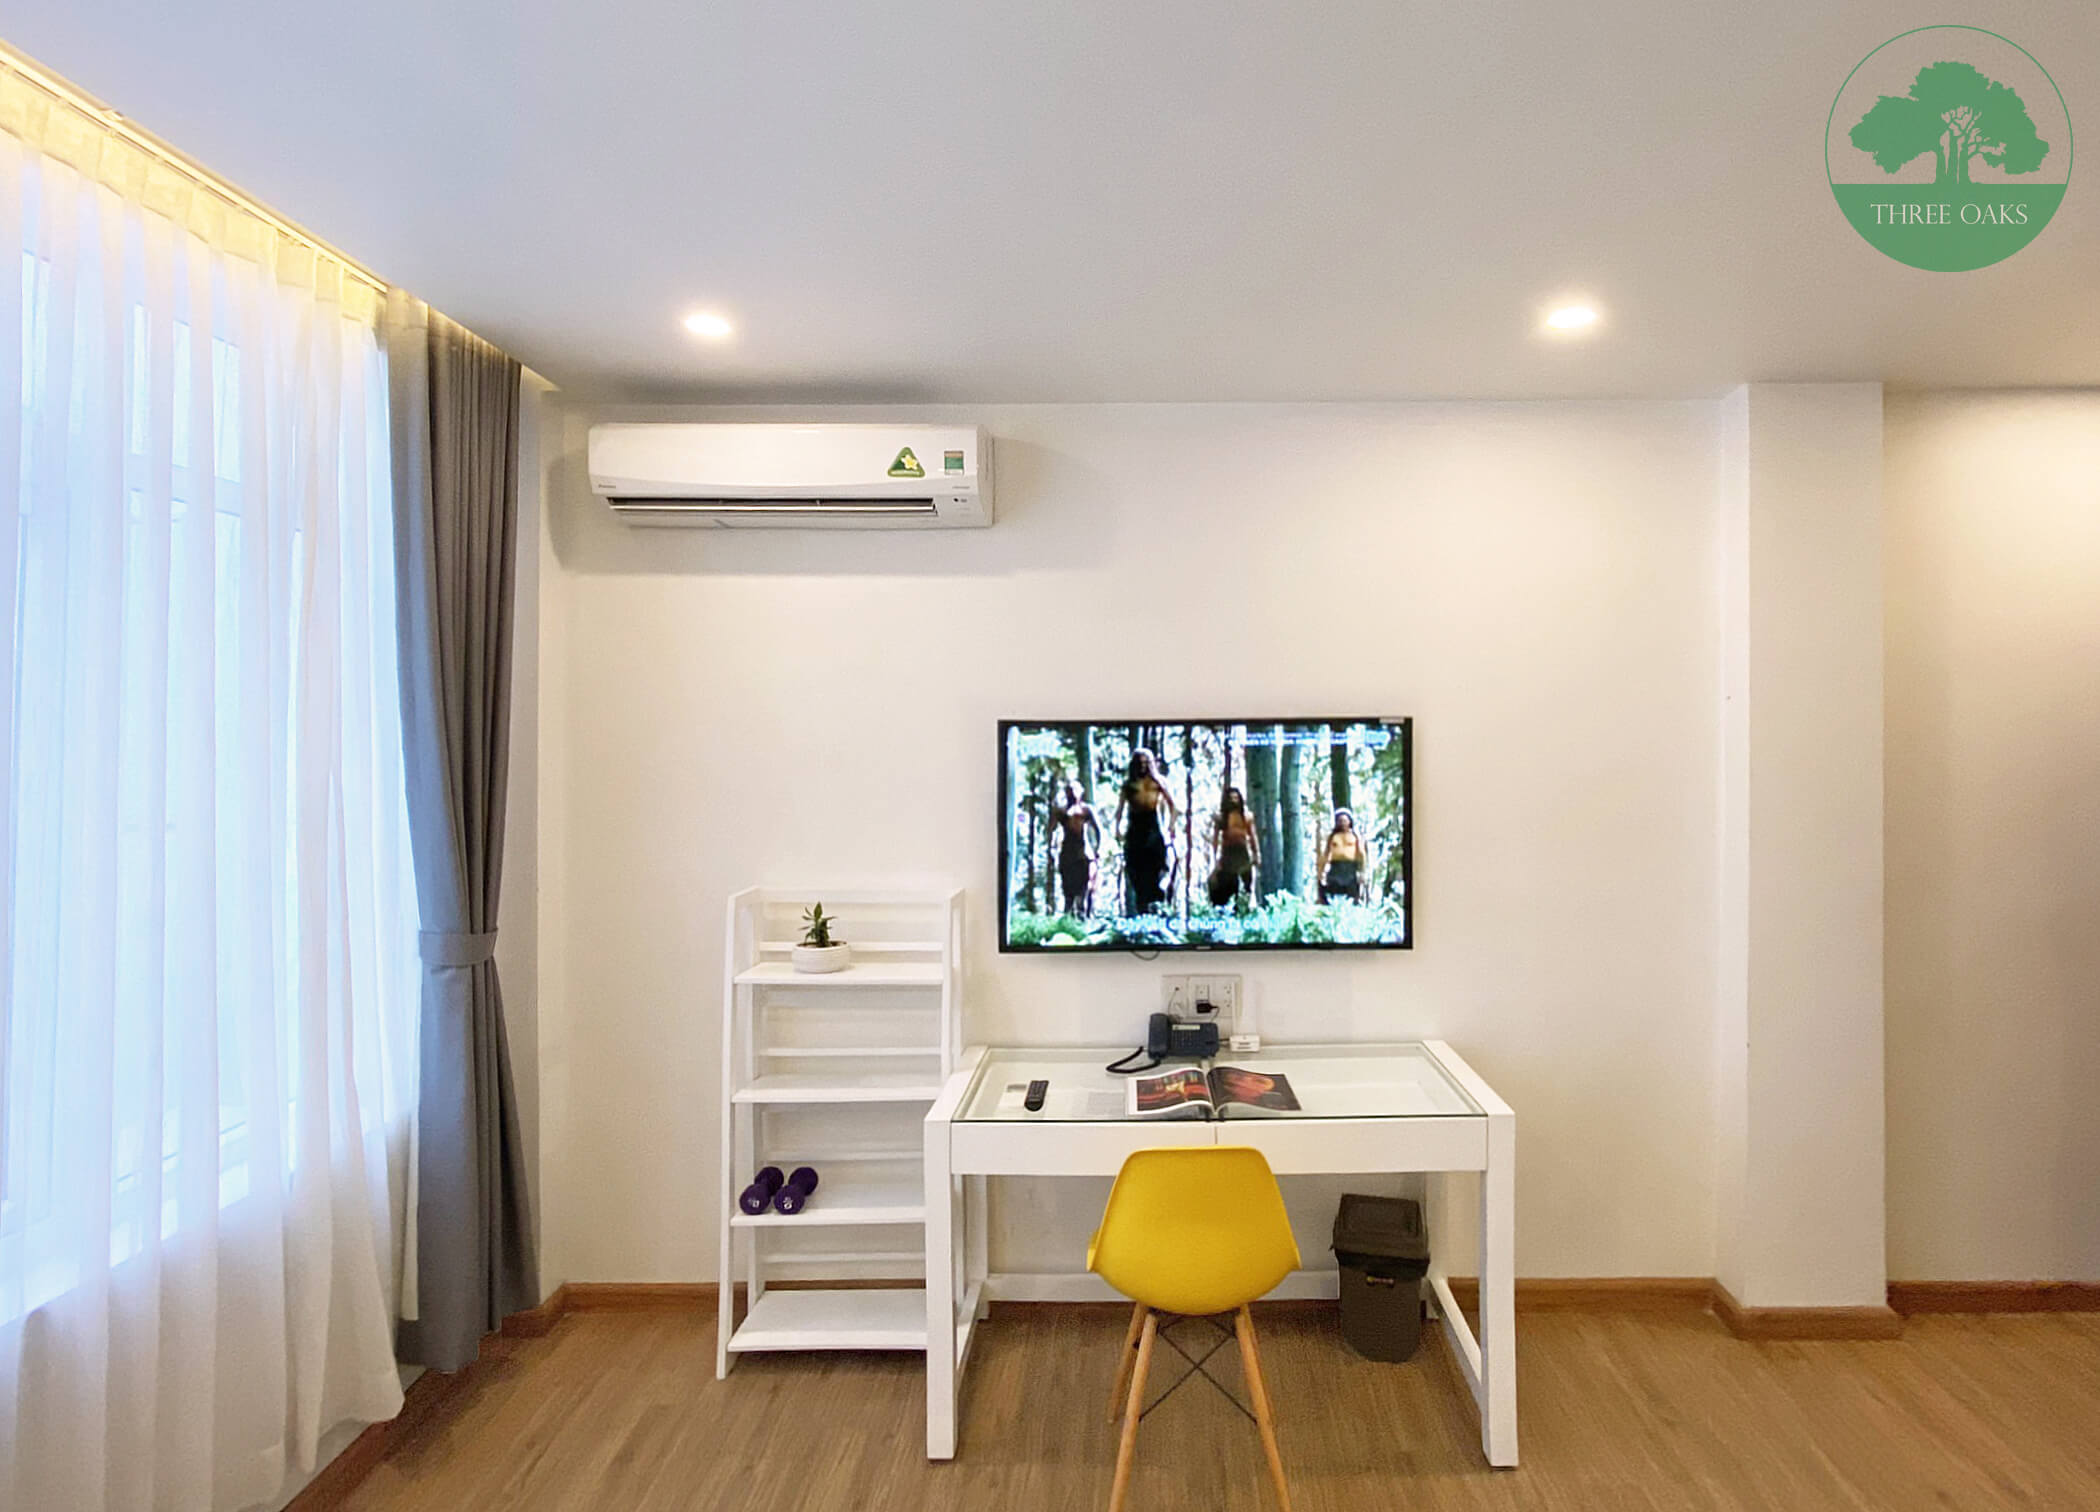 serviced-aparment-room-for-rent-saigon-one-bedroom-superior-12